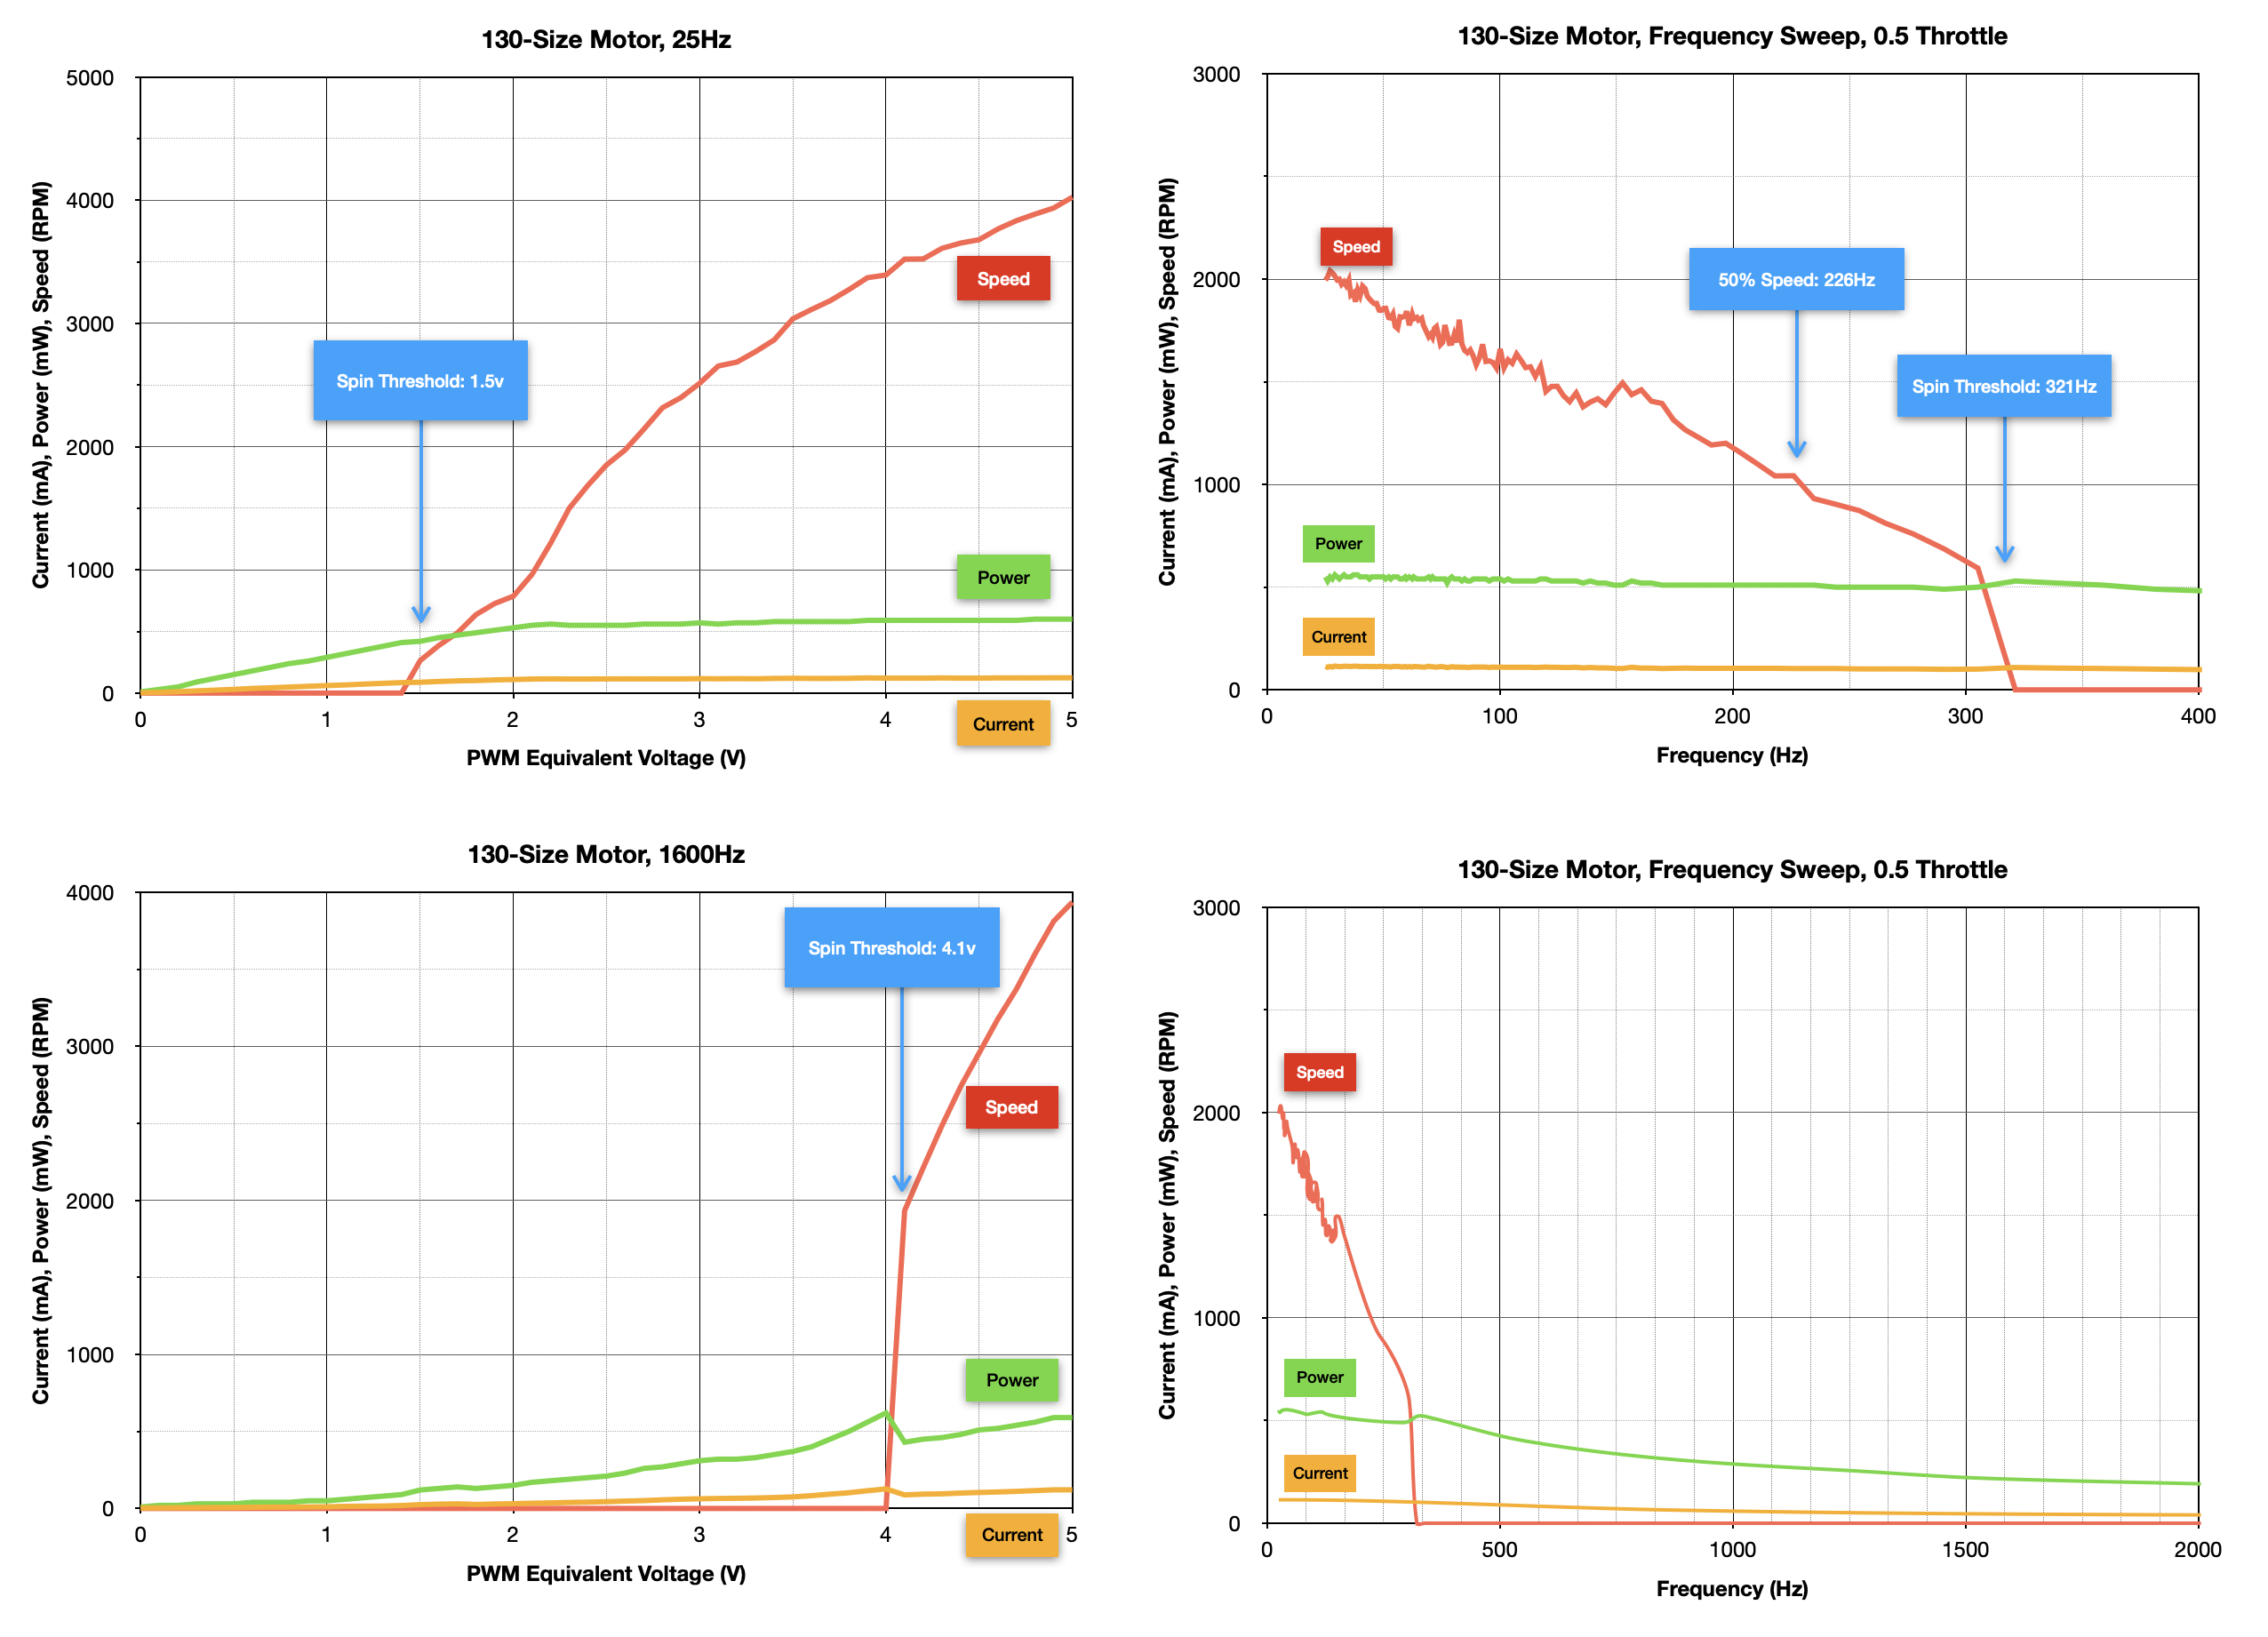 robotics___cnc_130-Size_Motor_Summary_Graphs.png